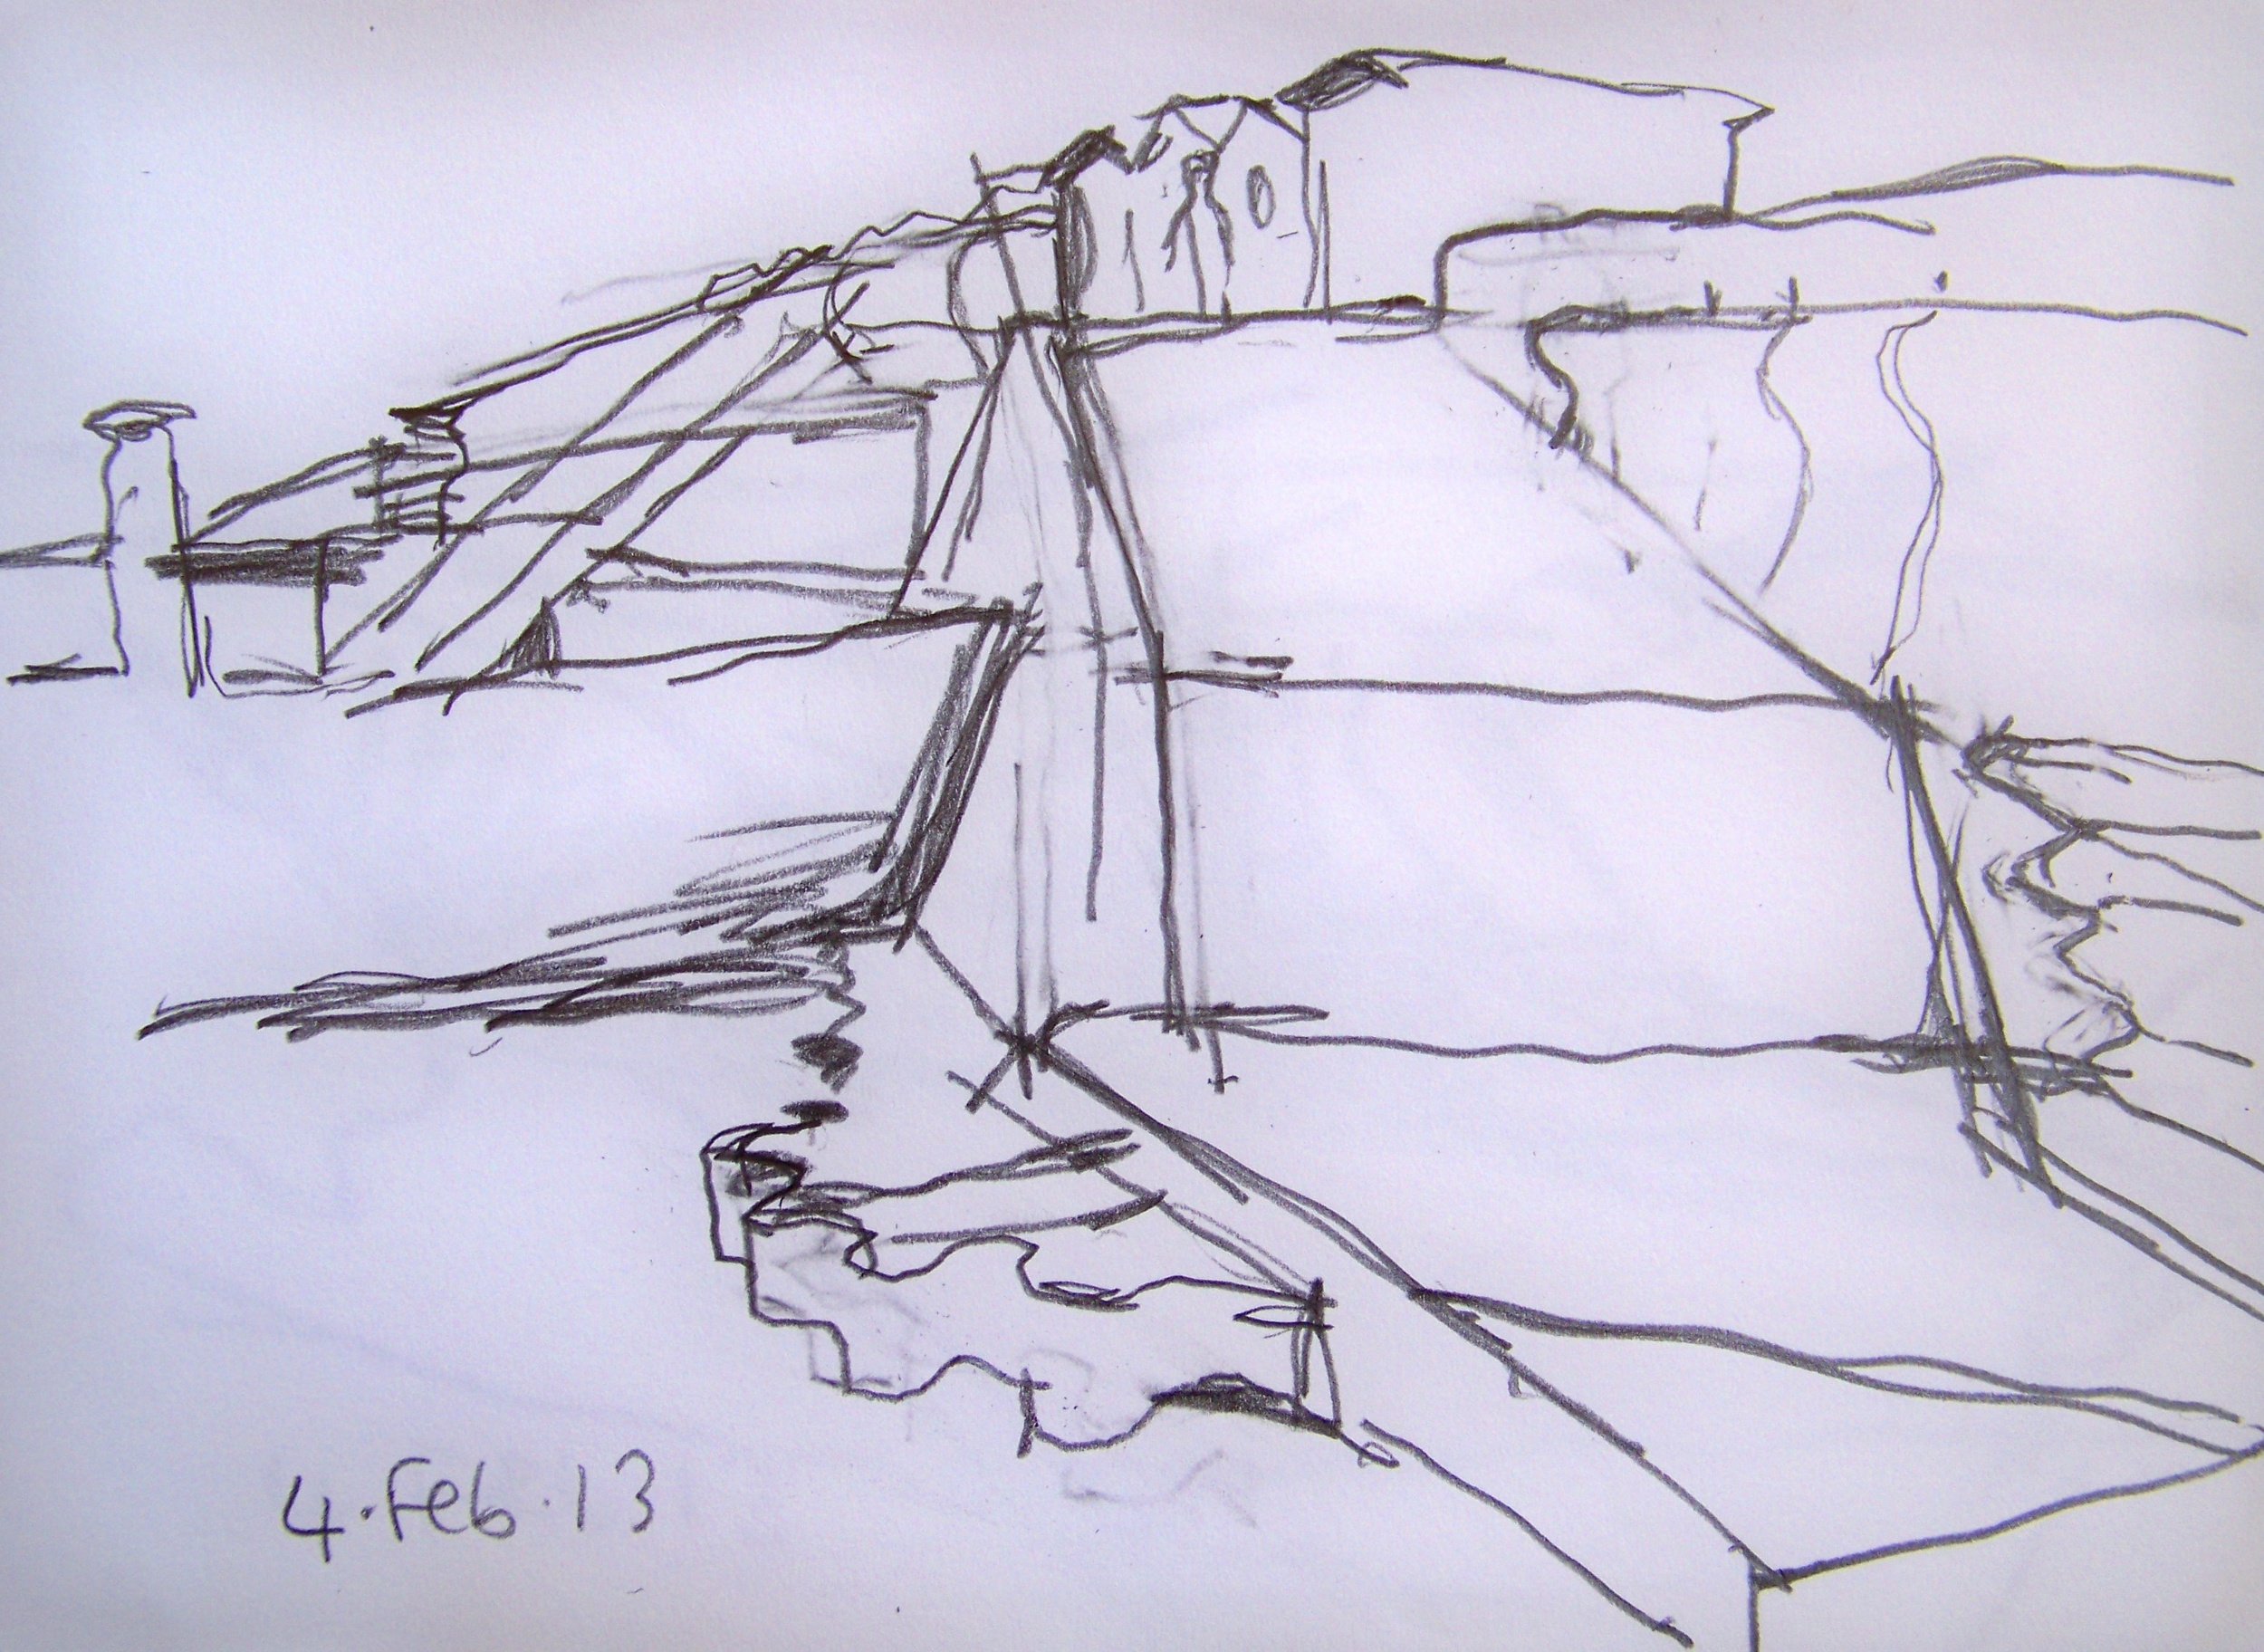 Seawall drawing, 2013